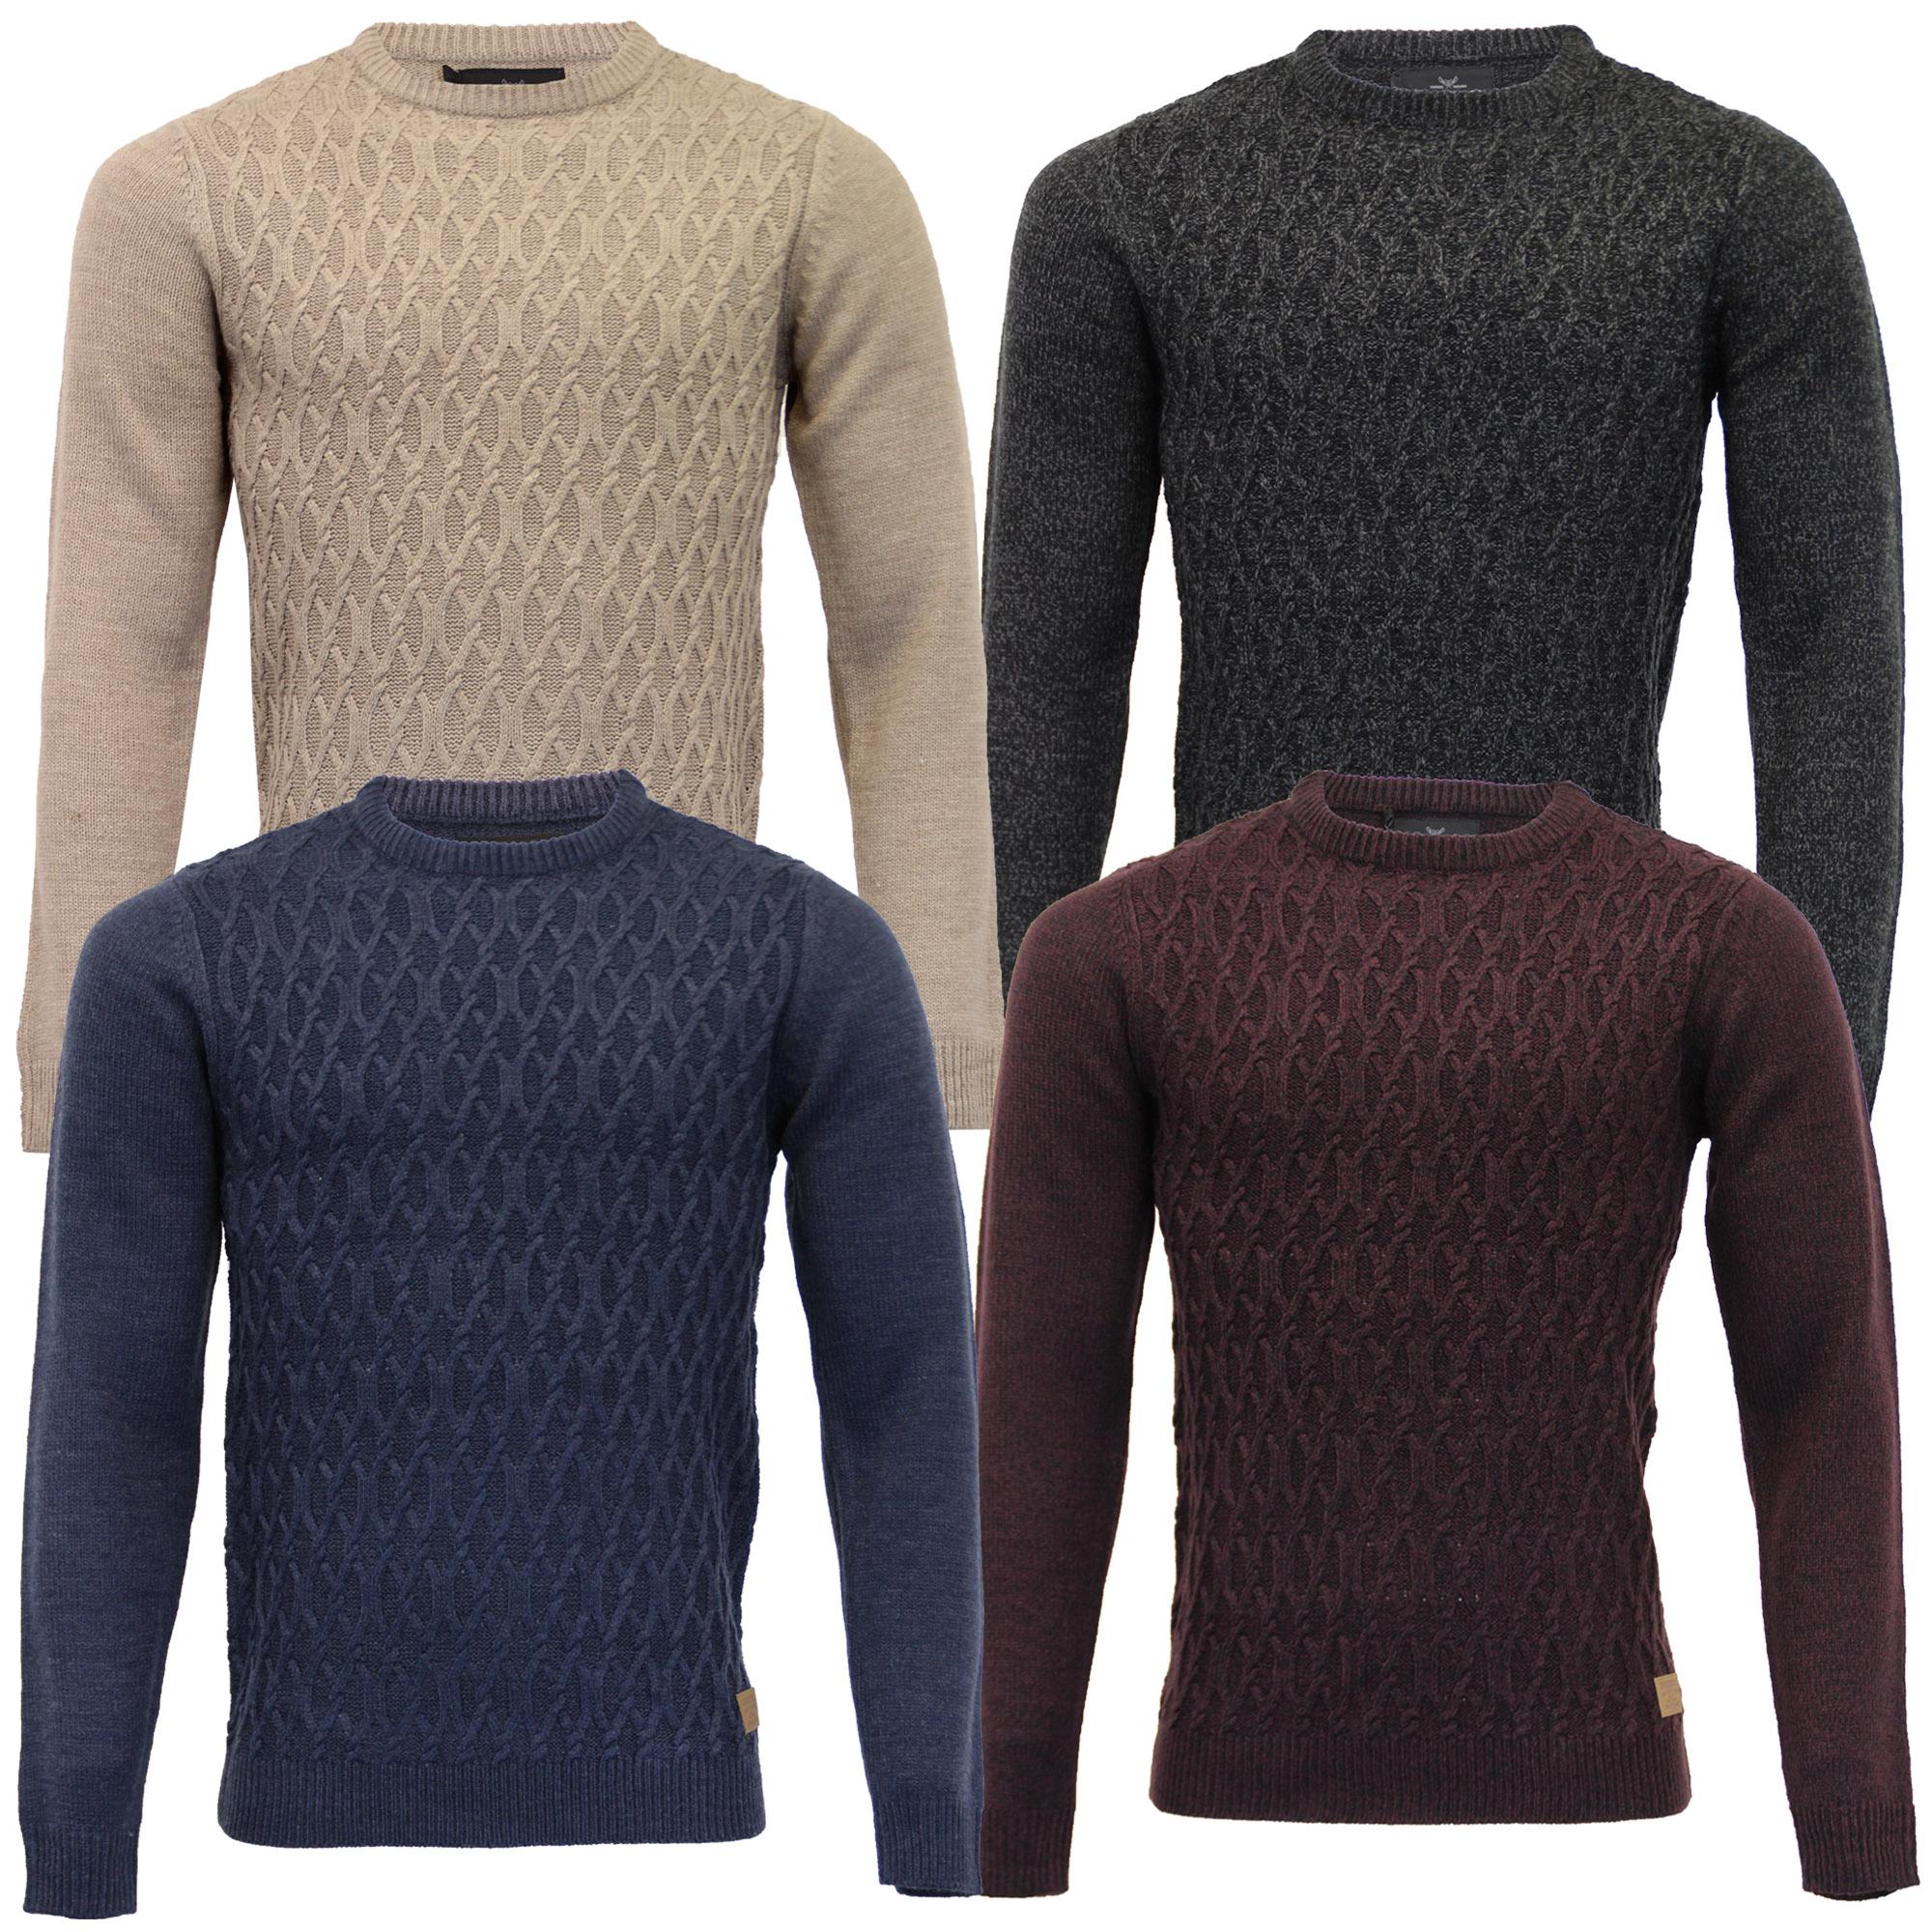 f426ed1d5fbb2e Mens Textured Knit Jumper Threadbare Sweater Pullover Crew Neck ...